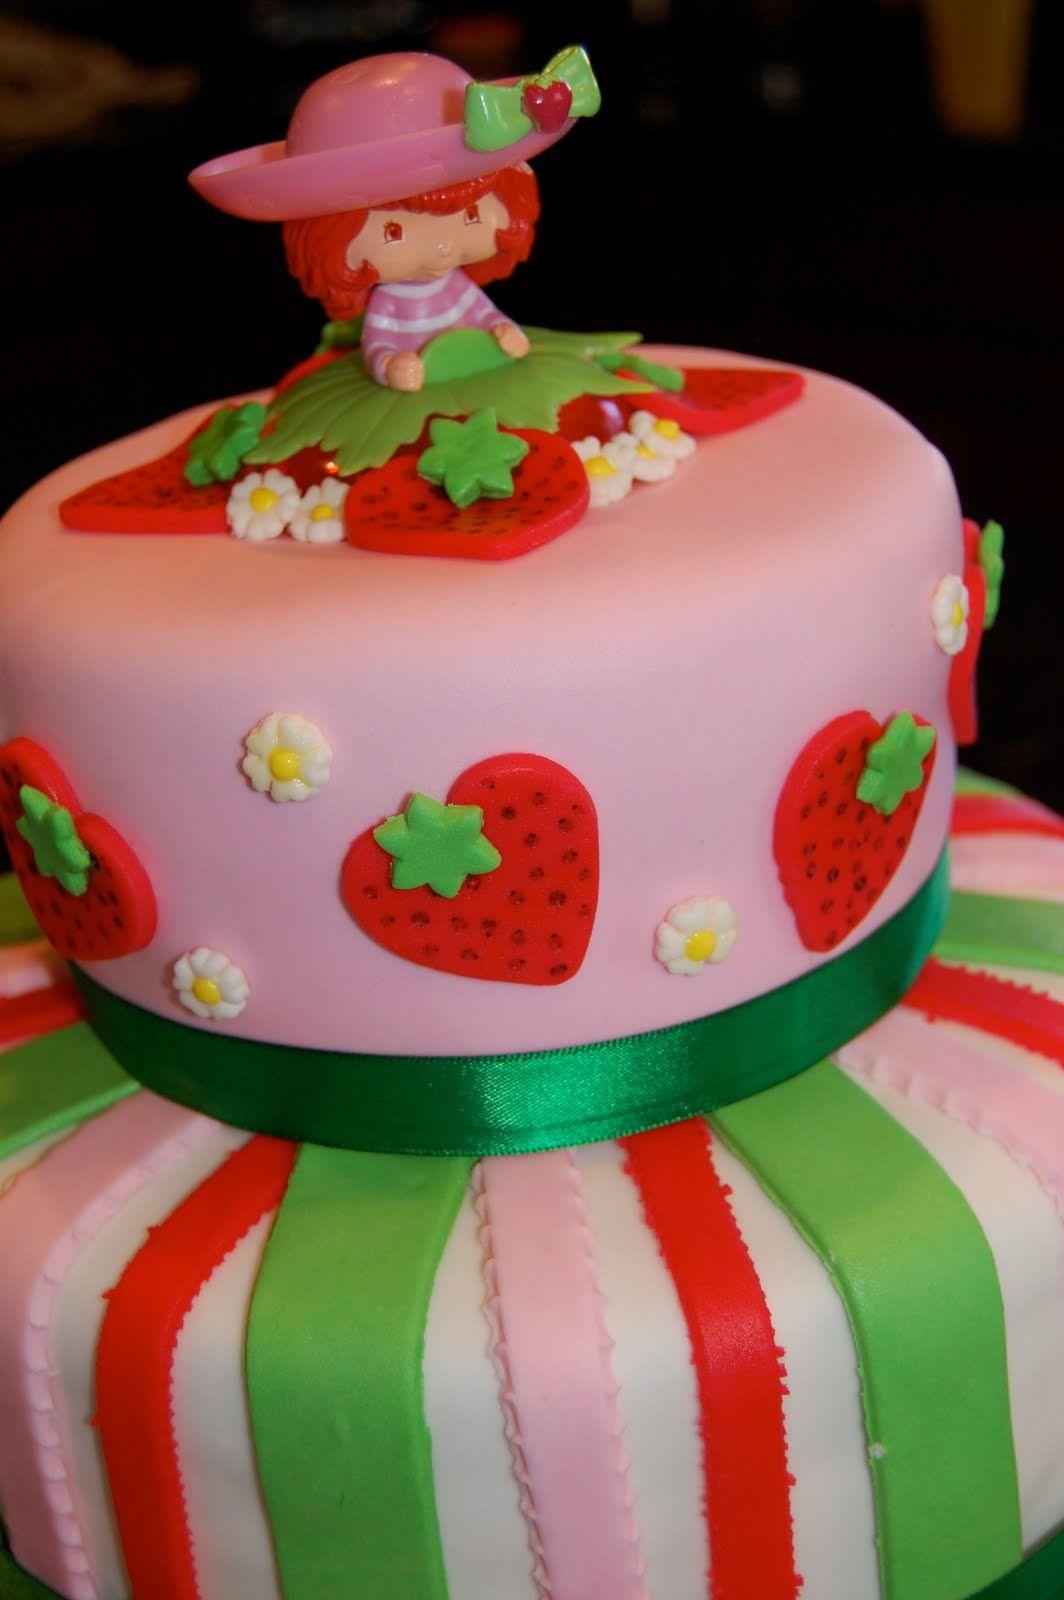 Prime Strawberry Shortcake Cakes For Kids Cakepins Com Shortcake Cake Personalised Birthday Cards Veneteletsinfo